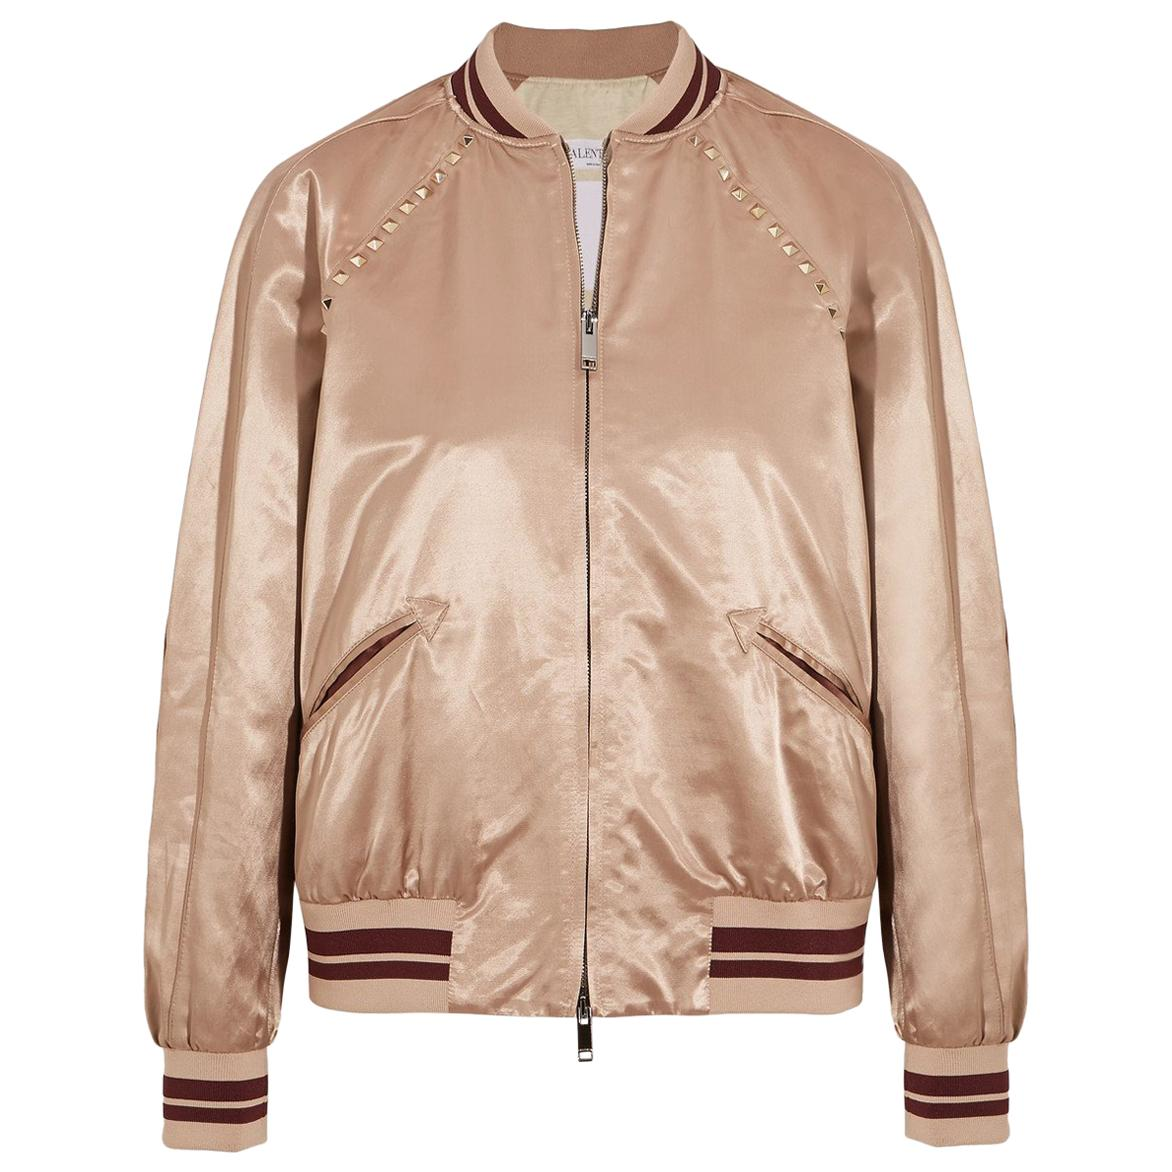 Valentino The Rockstud Embellished Satin Bomber Jacket